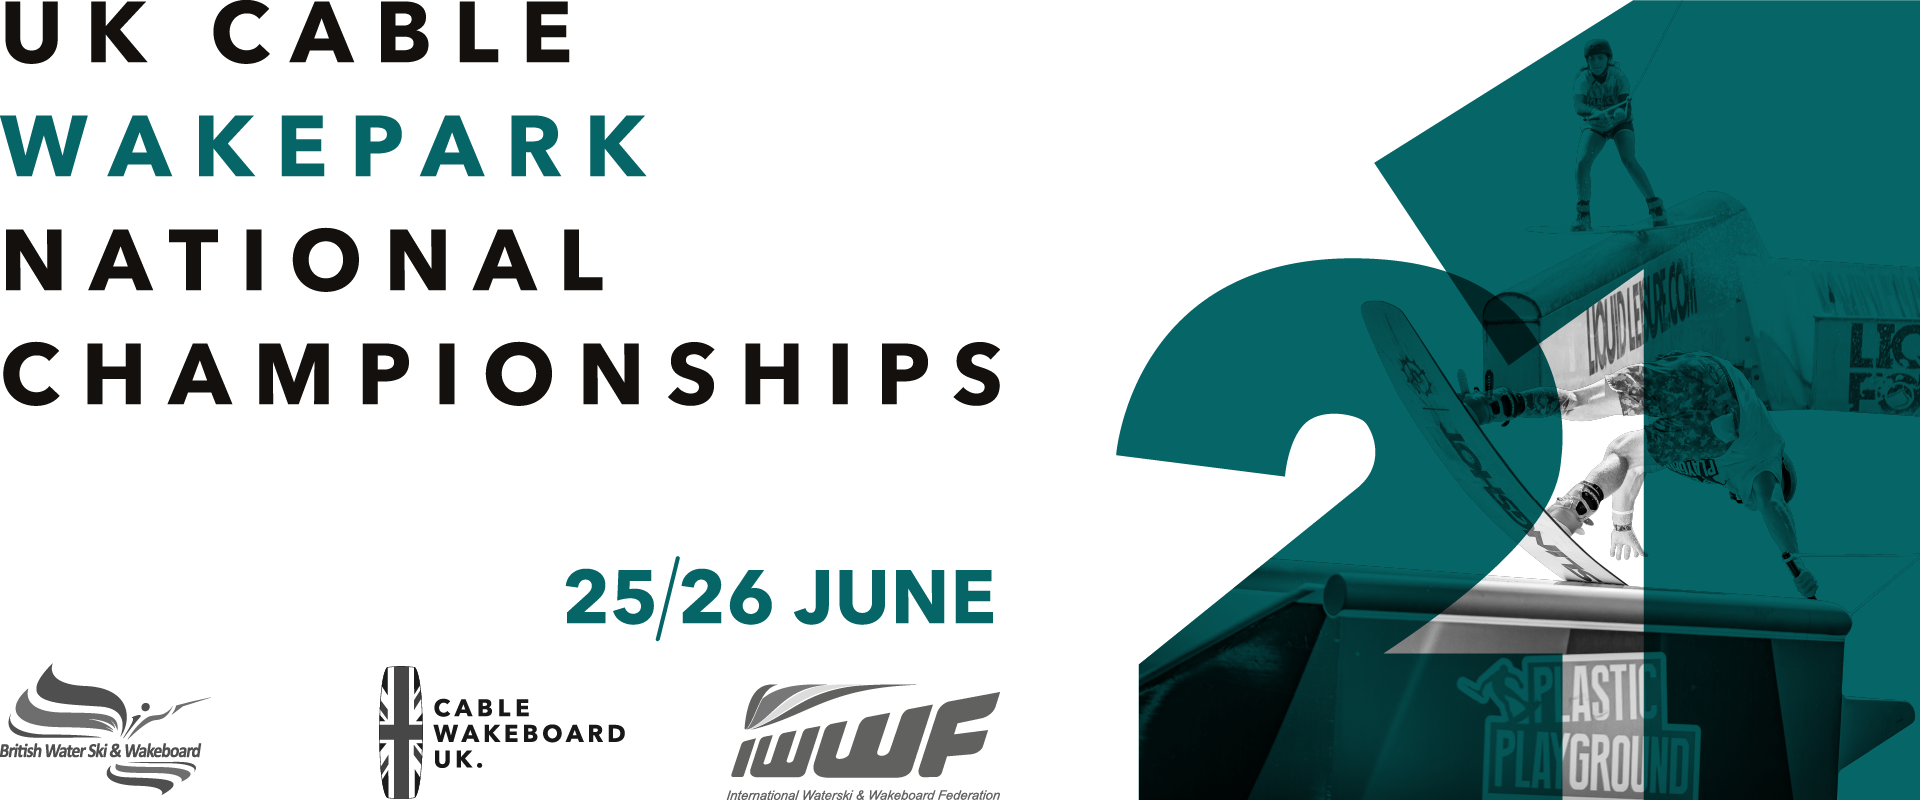 UK Cable Wakepark National Championships